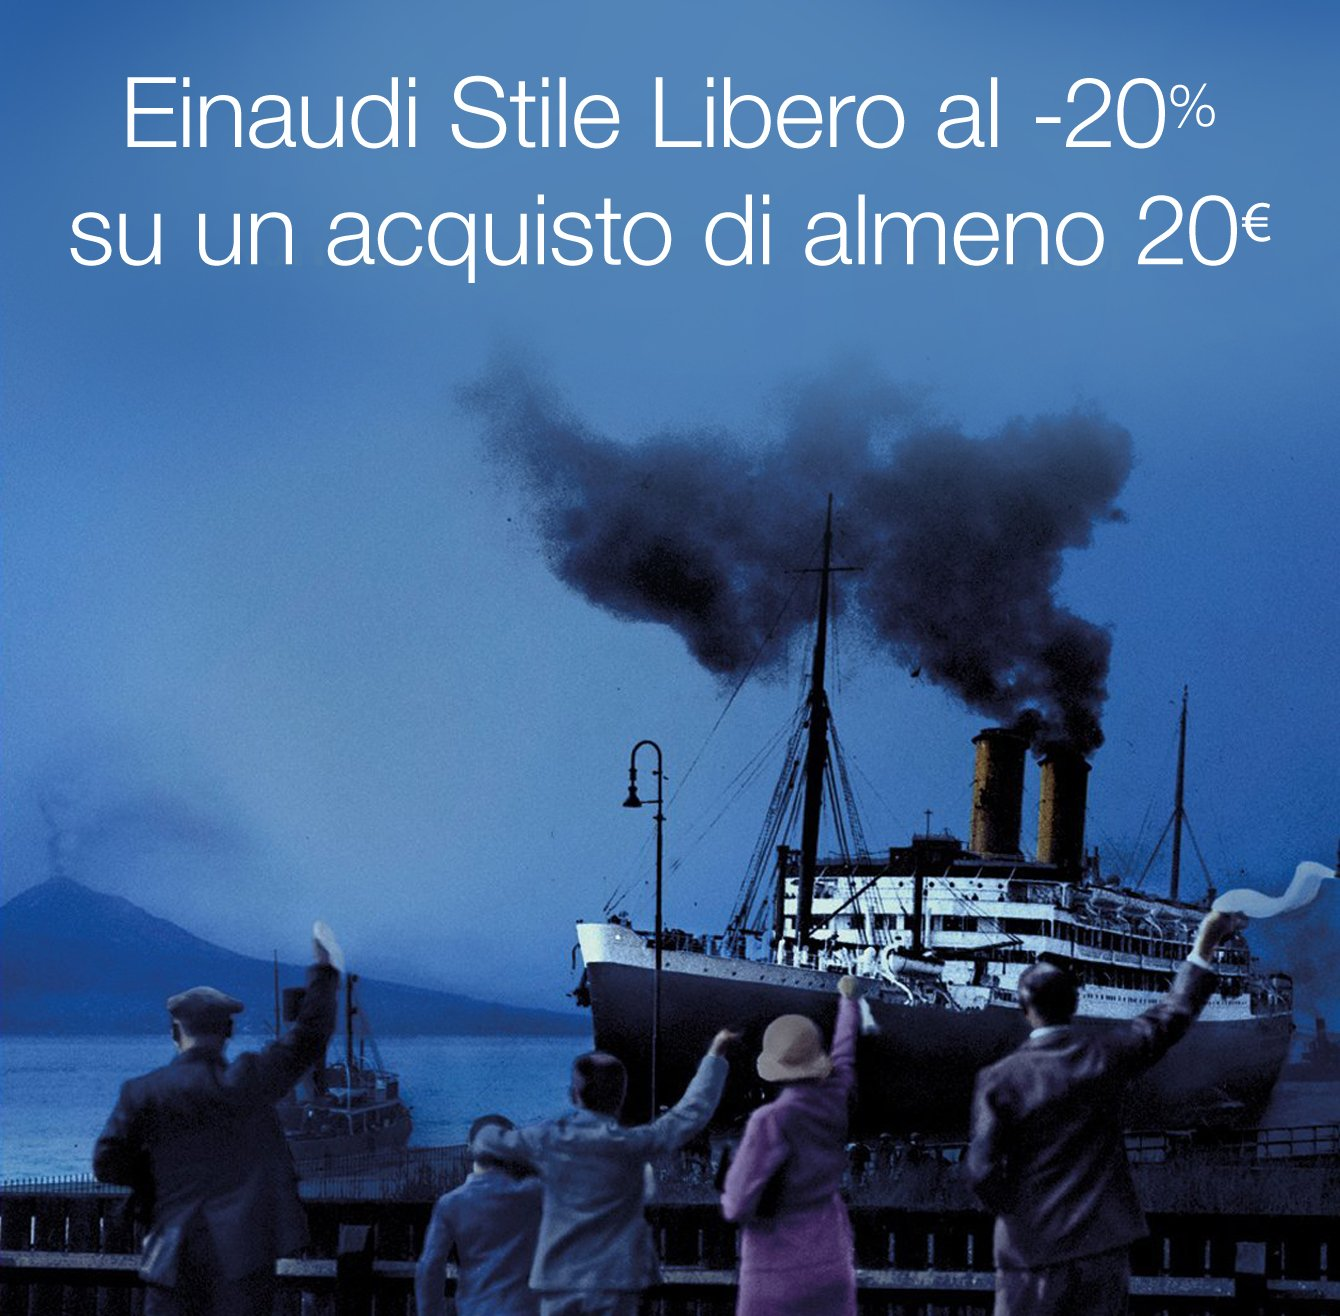 Einaudi Stile Libero al -20%